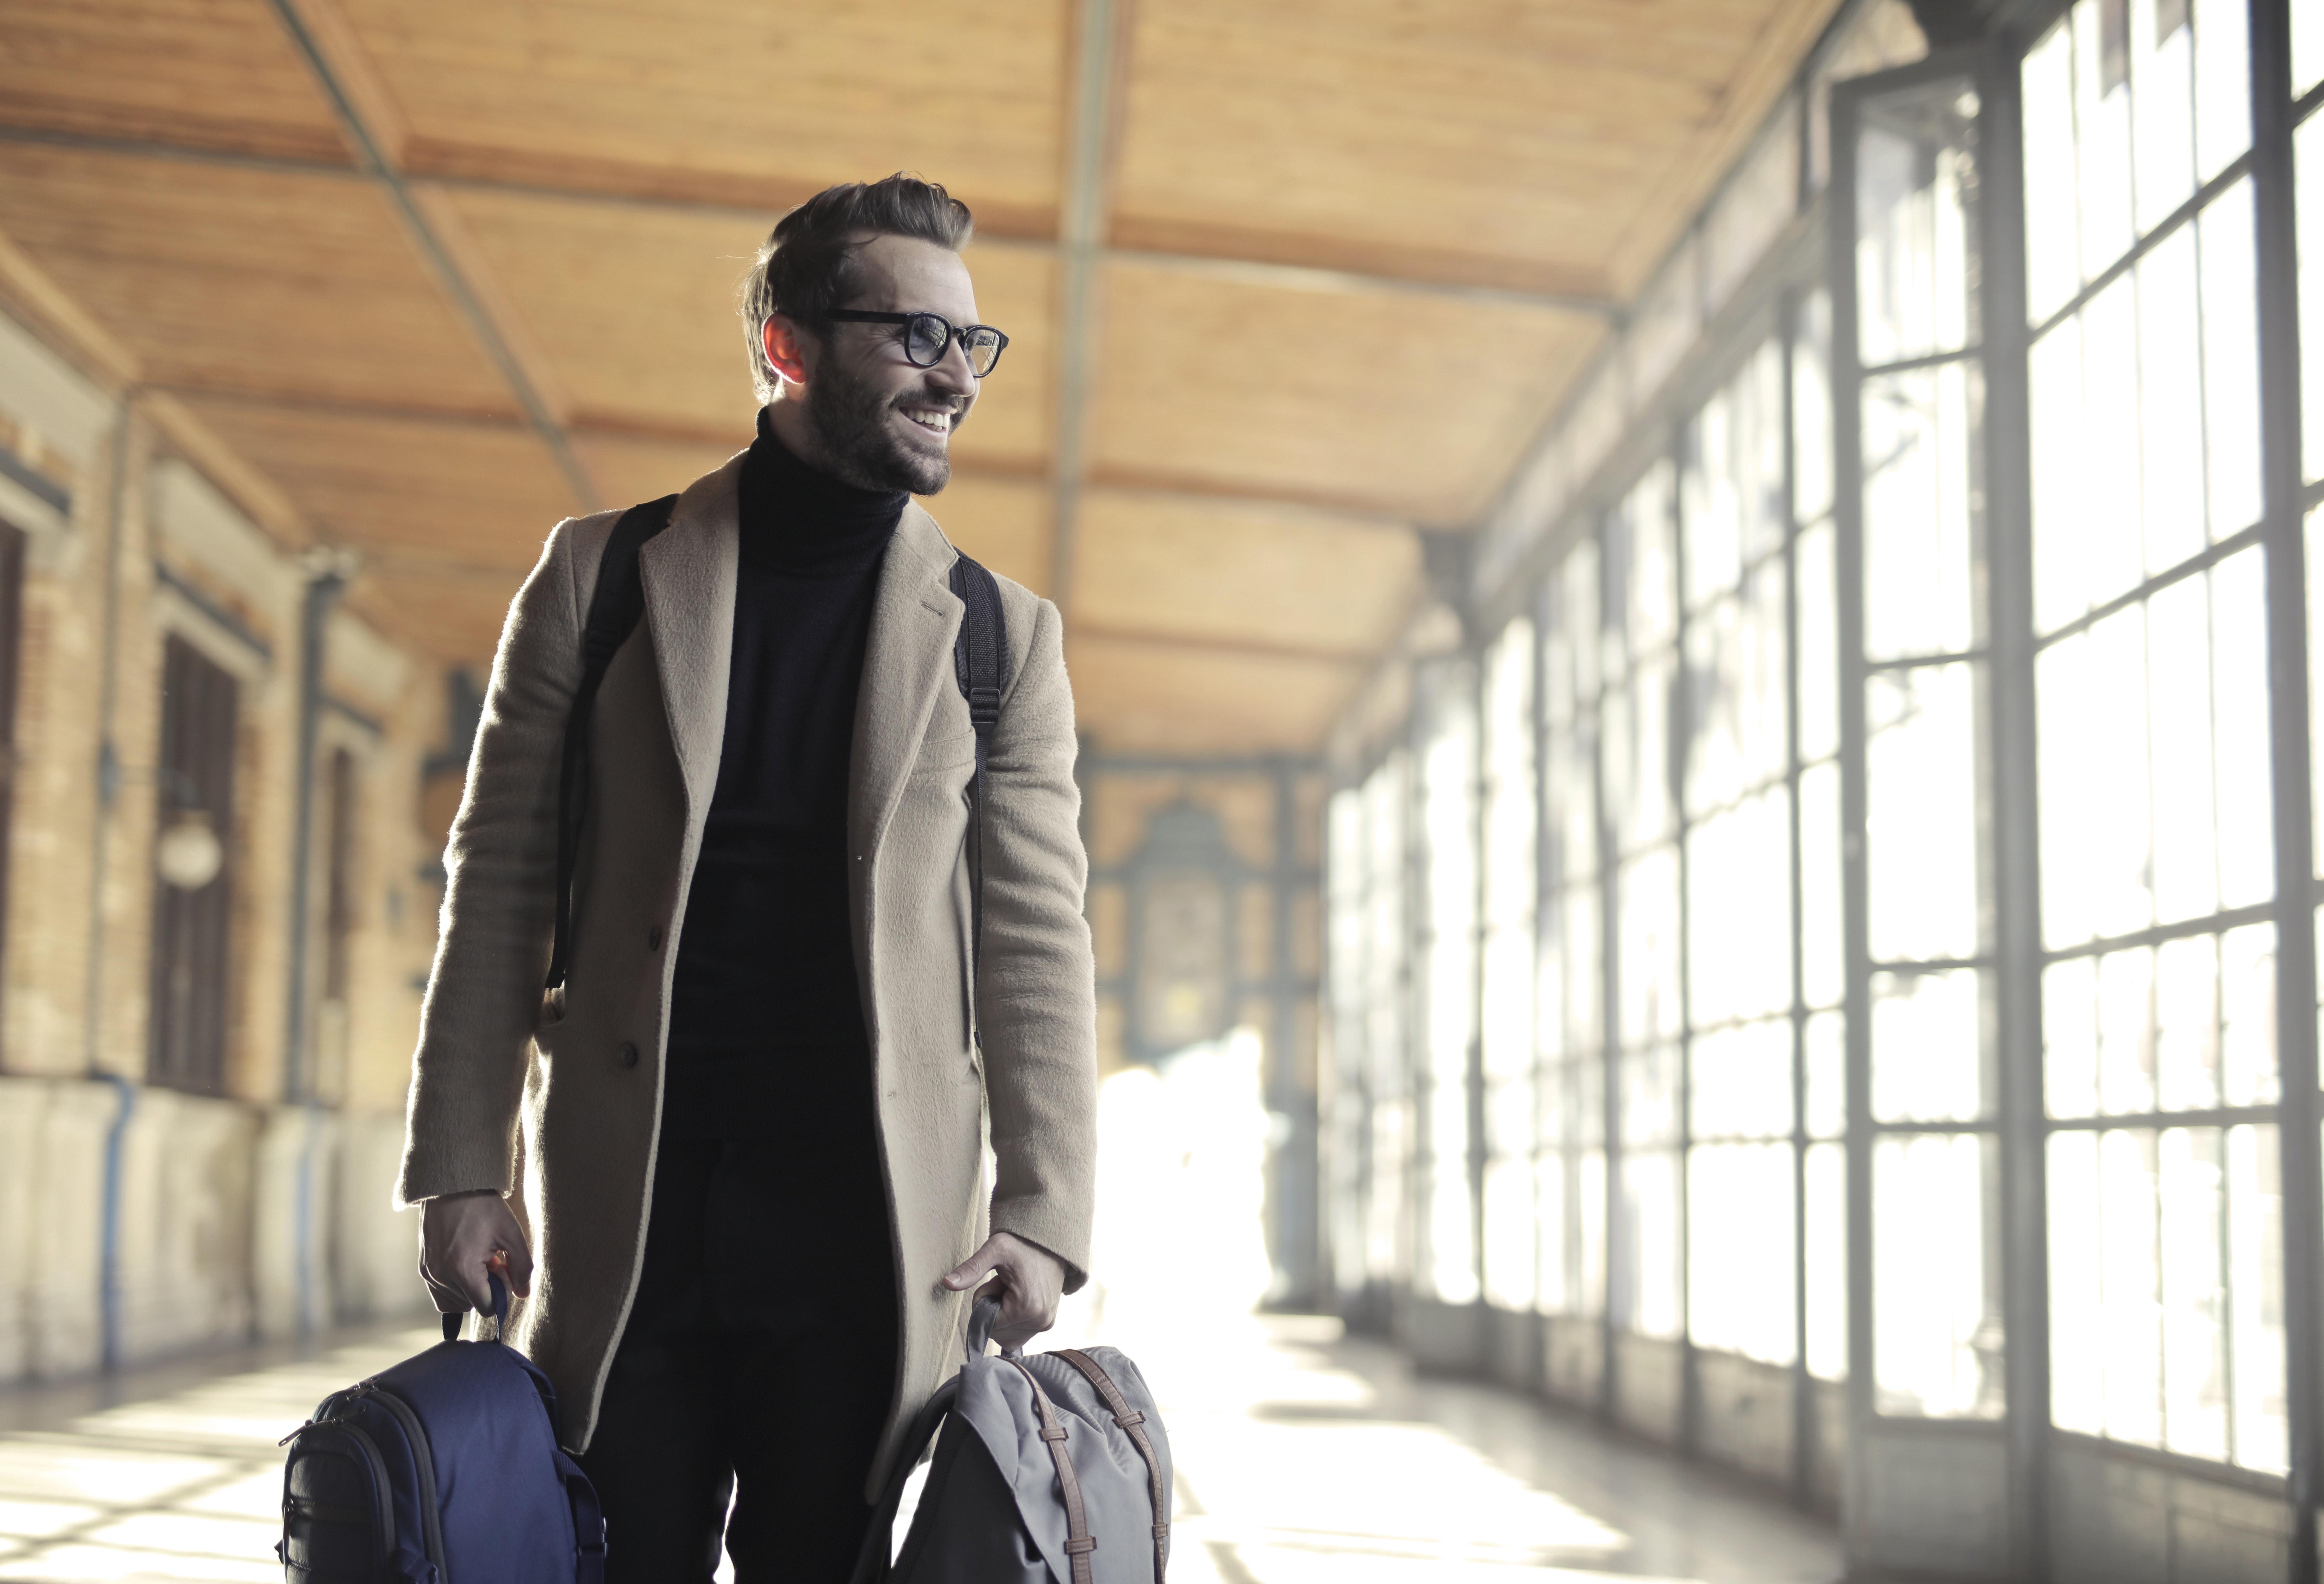 Man in brown robe carrying bag smiling photo